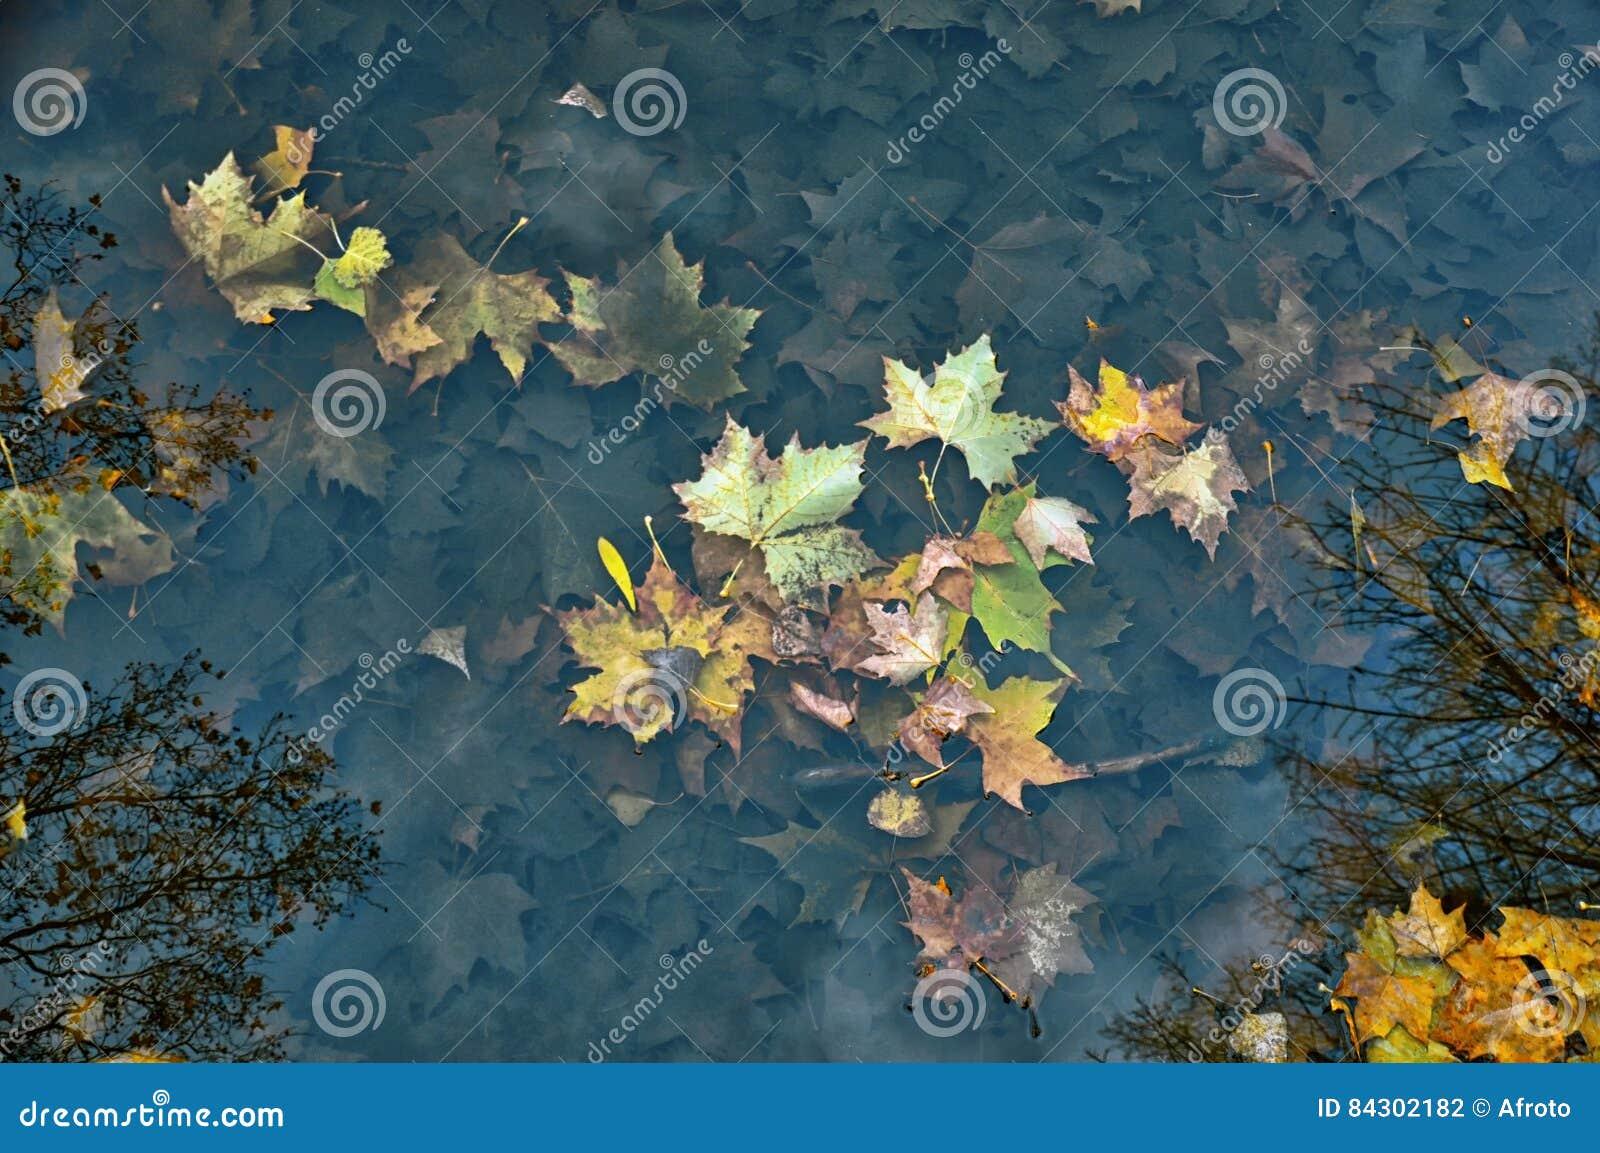 Autumn wet leaves